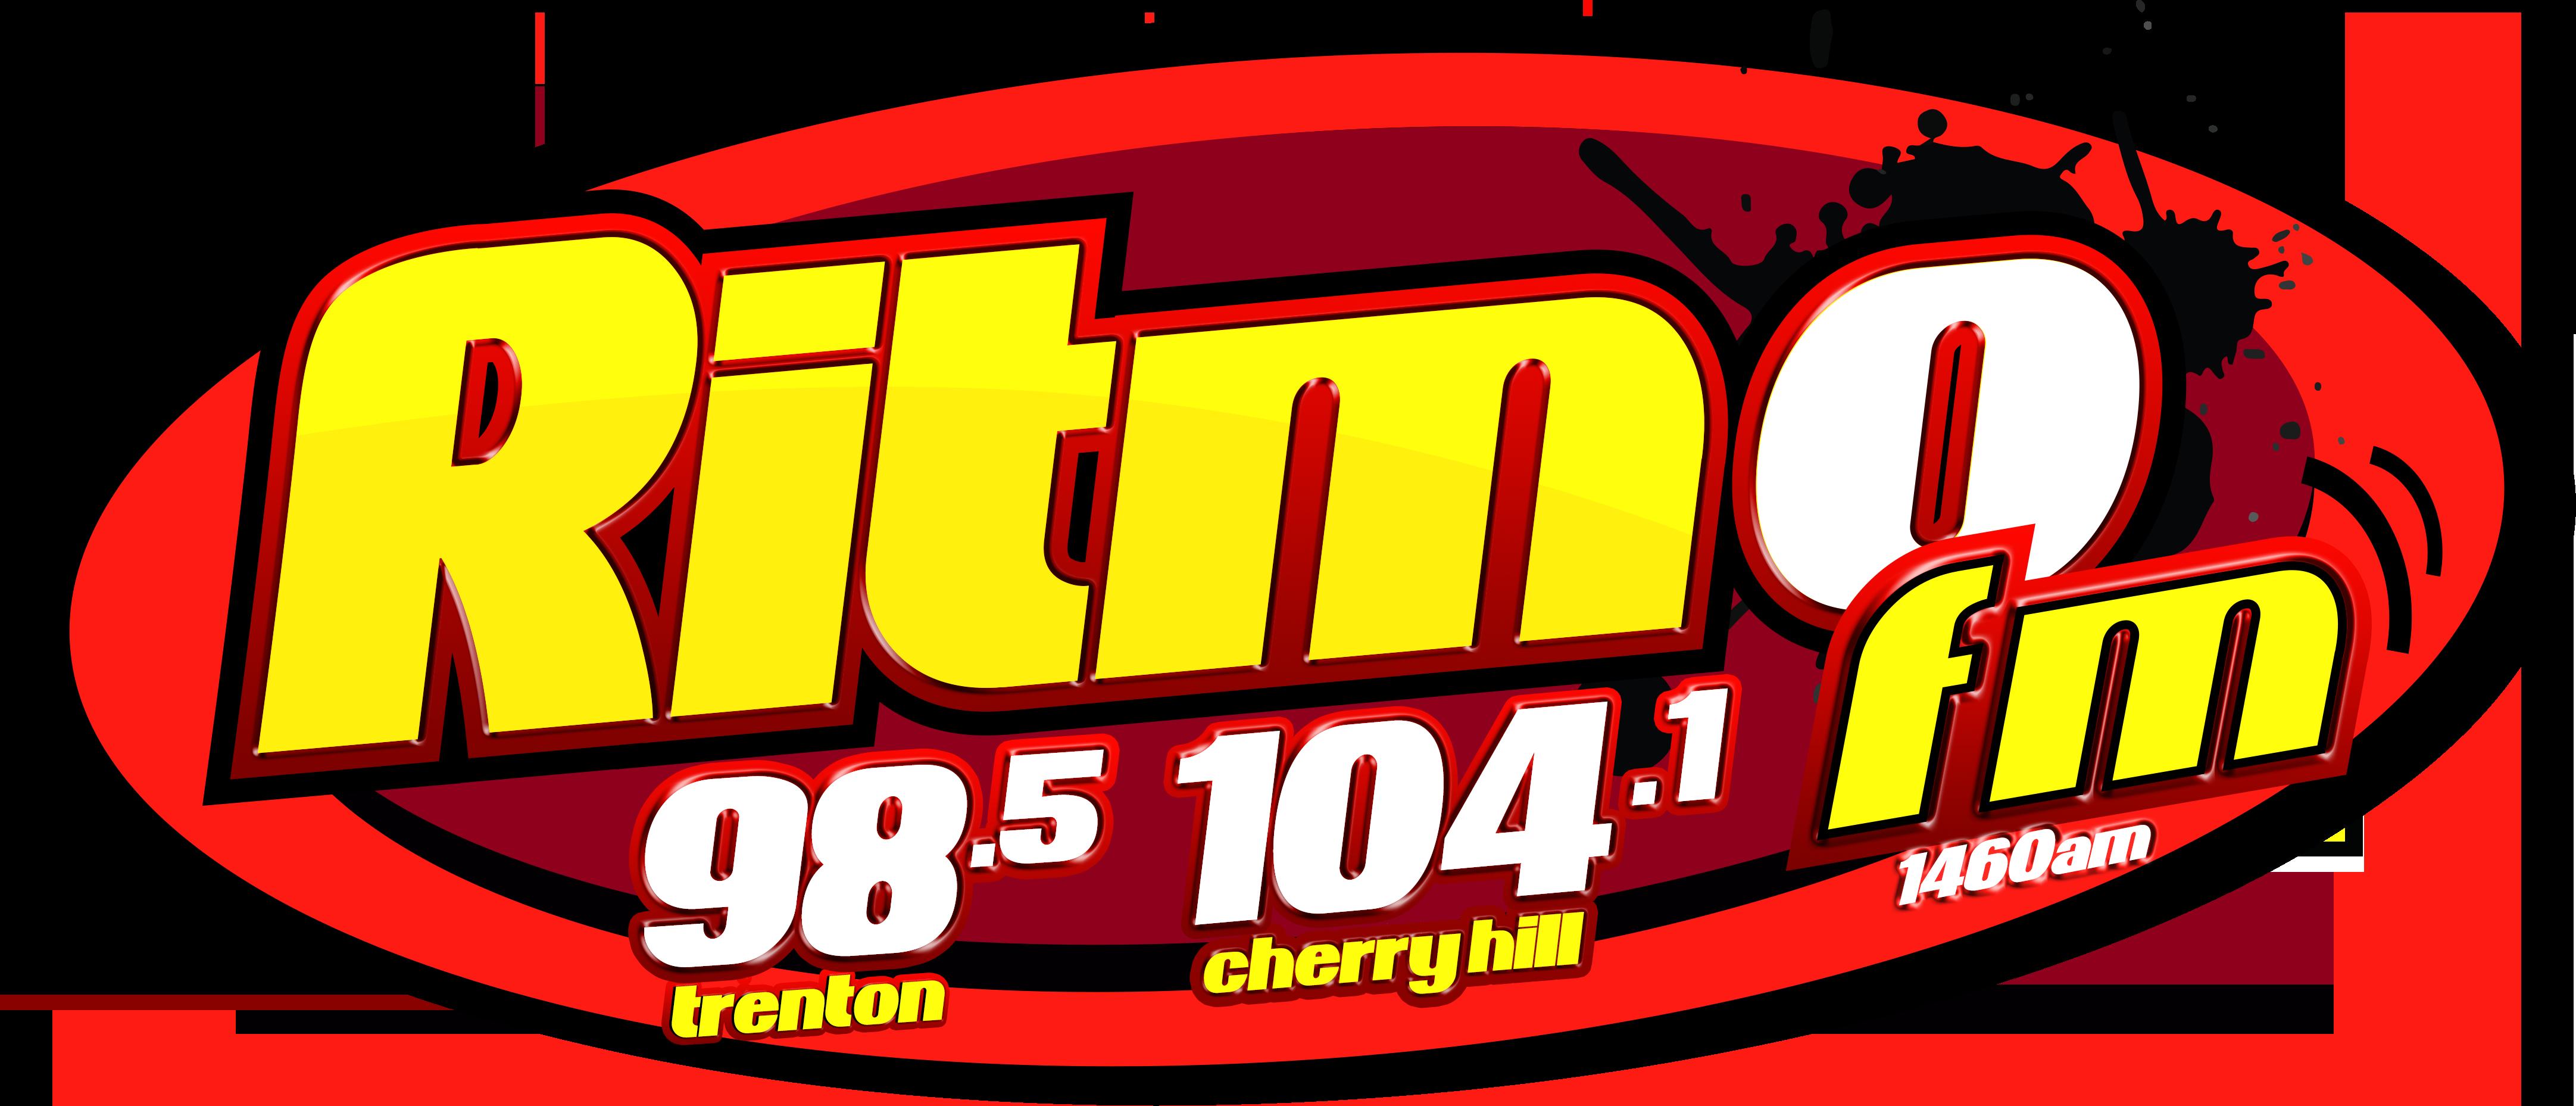 Logo Miritmofm.com